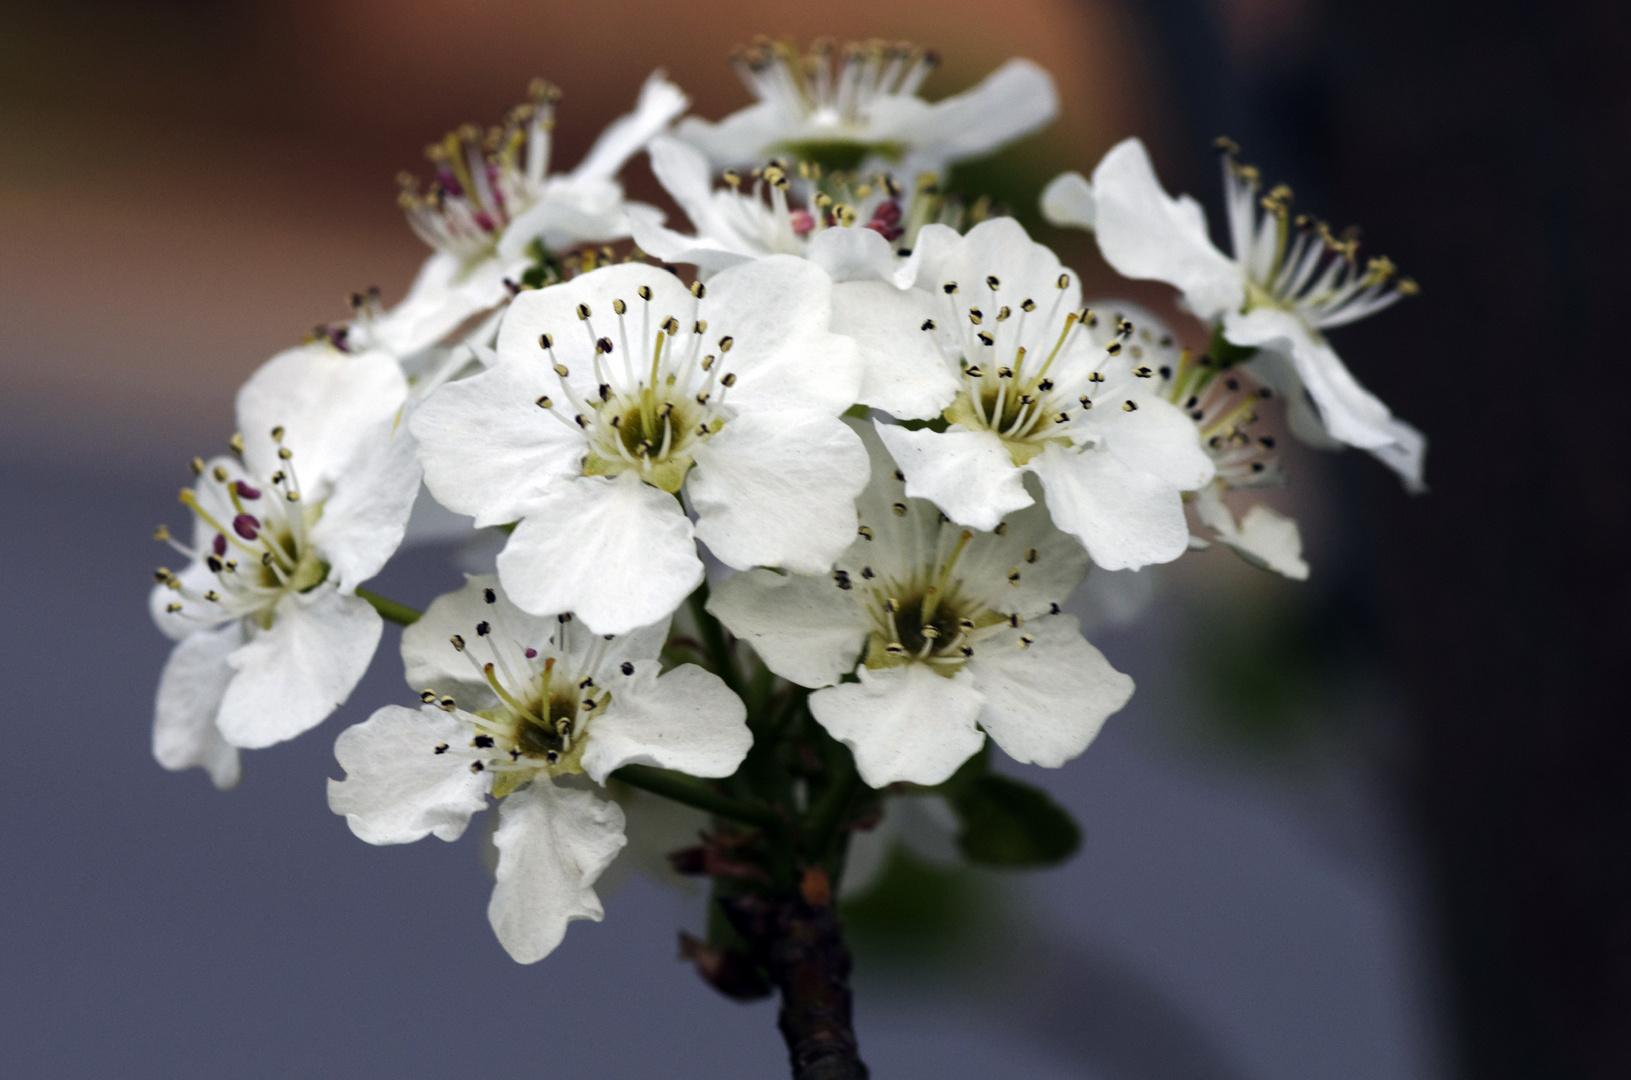 Cherry flowers in Washington DC